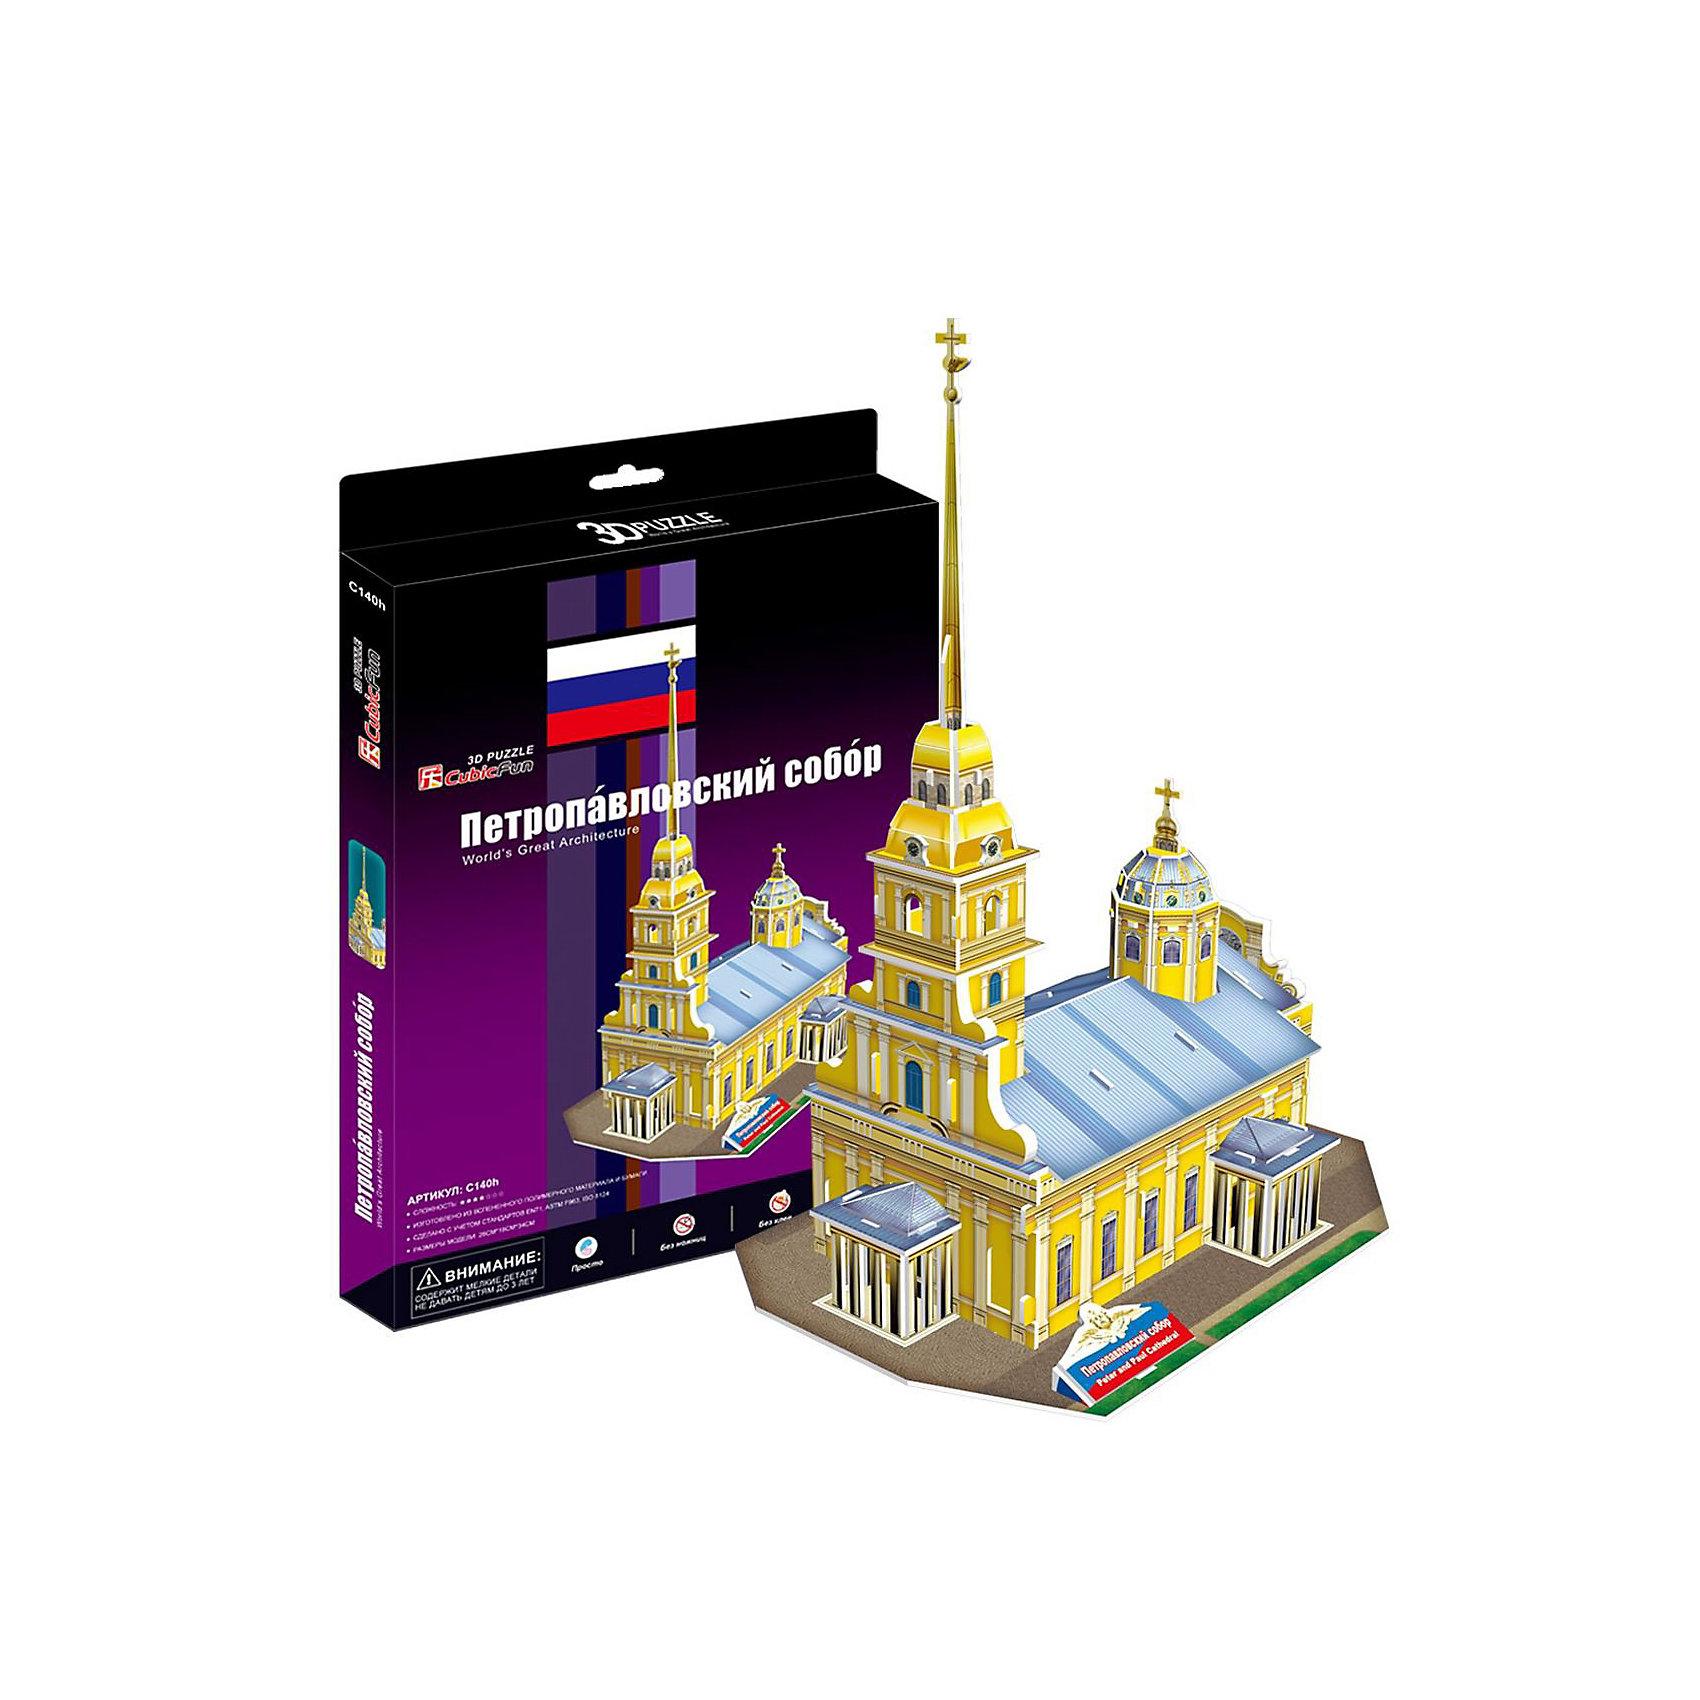 CubicFun Пазл 3D Петропавловский собор (Россия), CubicFun cubicfun 3d пазл эйфелева башня 2 франция cubicfun 33 детали